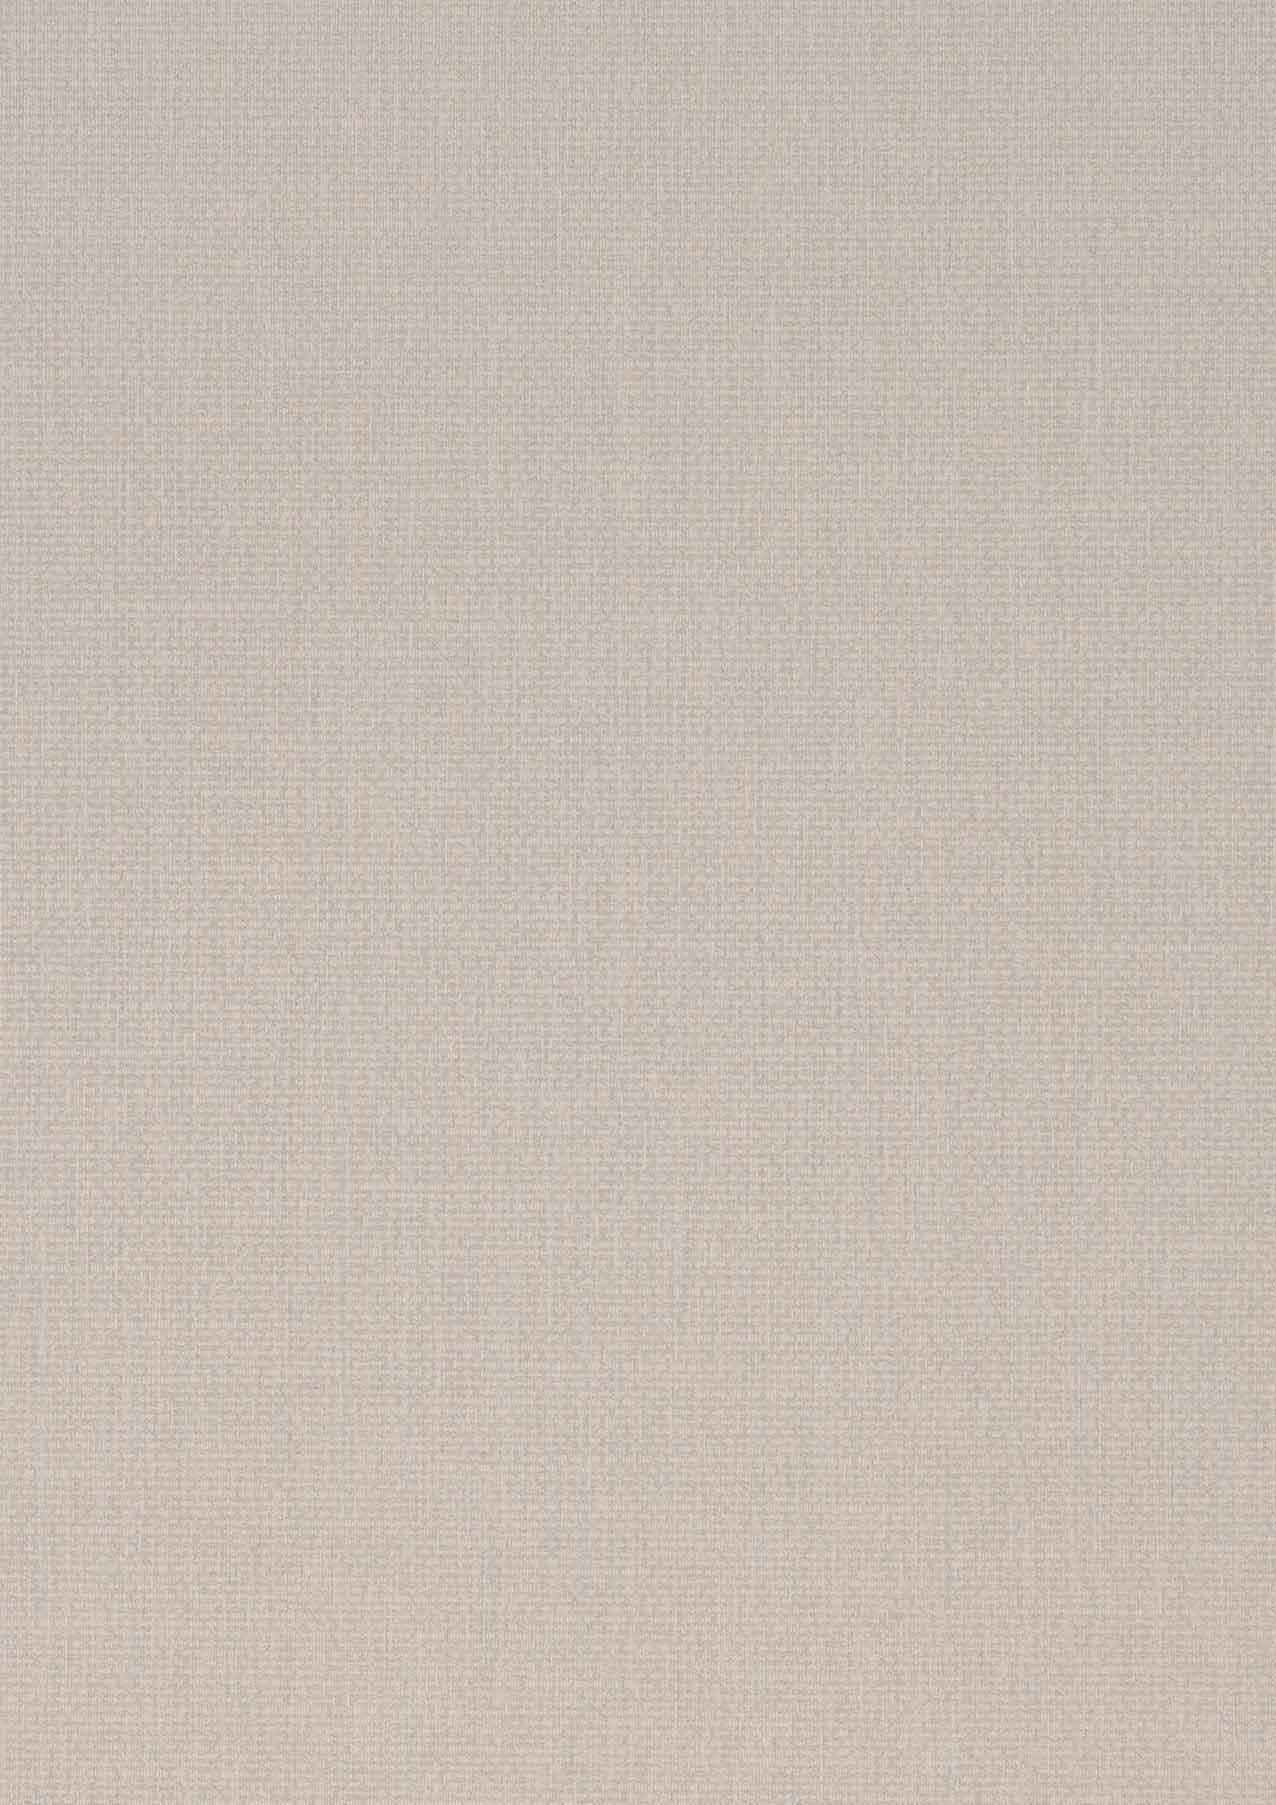 Tapete textile walls 07 creme tapeten der 70er for Tapete nach hause